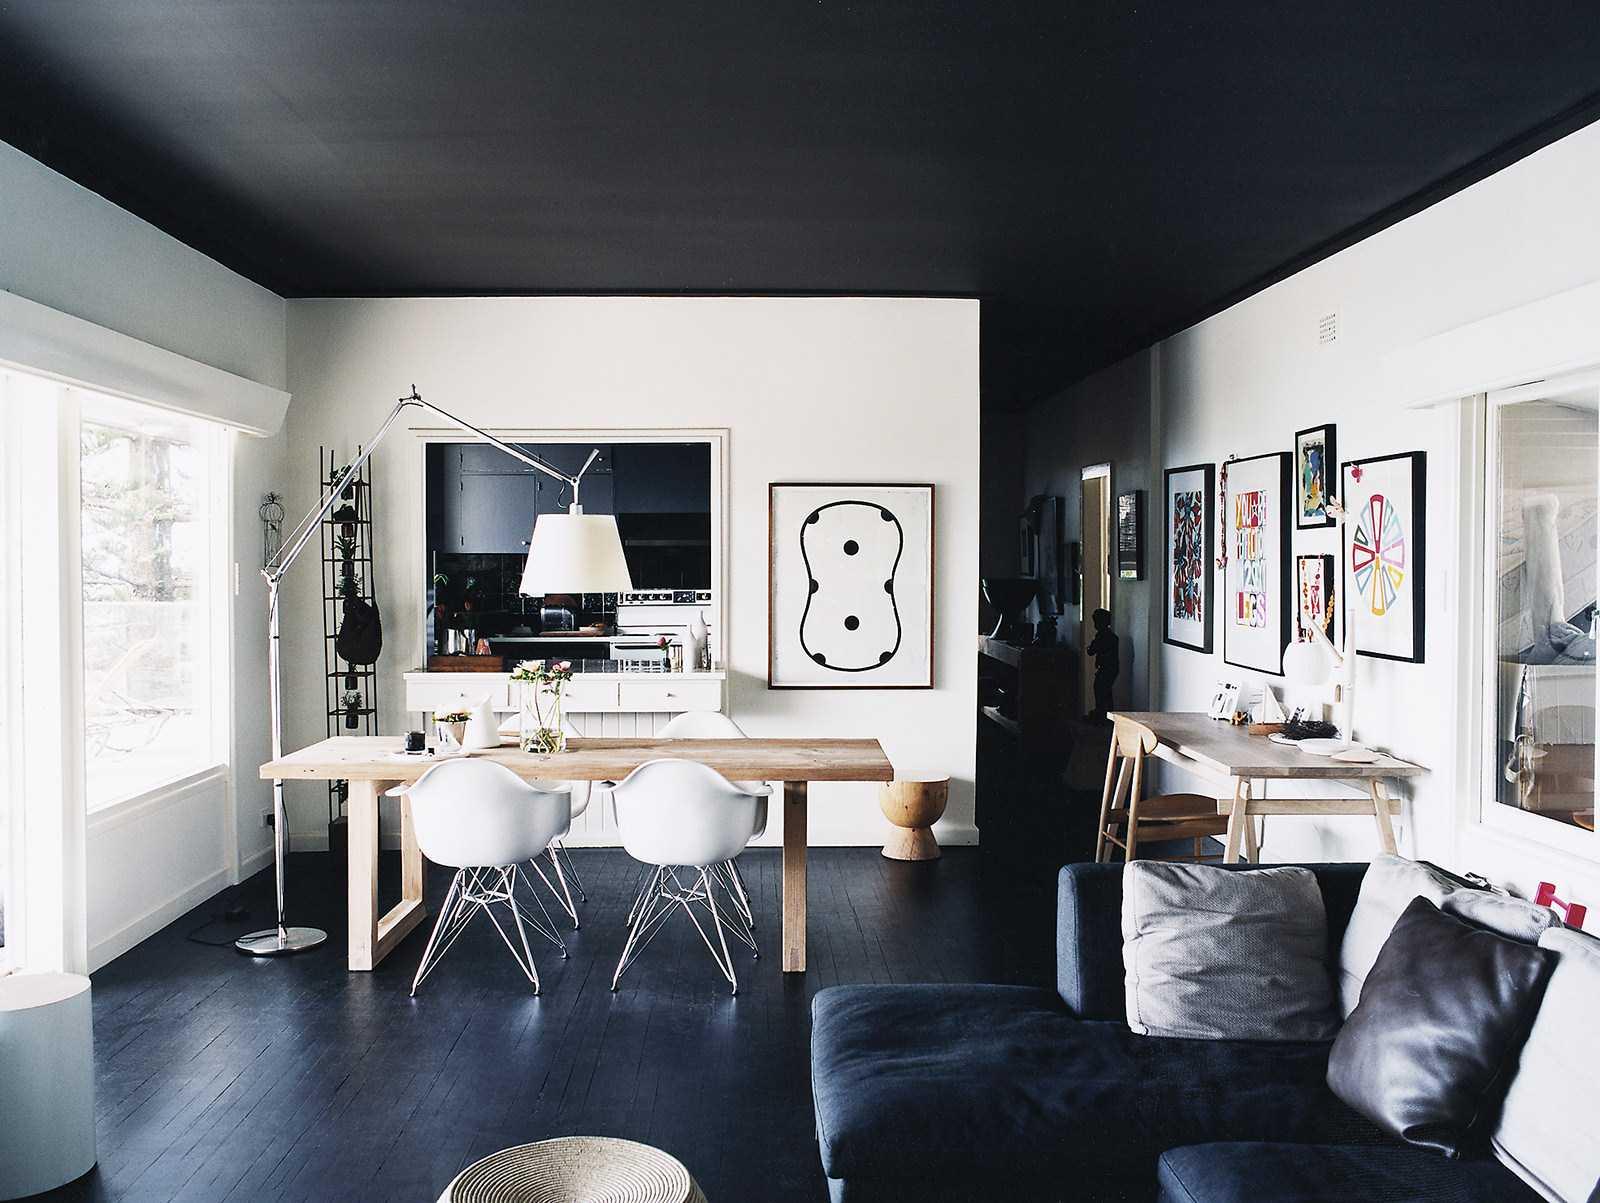 75 Contoh Menggunakan Lantai Gelap Di Pedalaman Dengan Foto